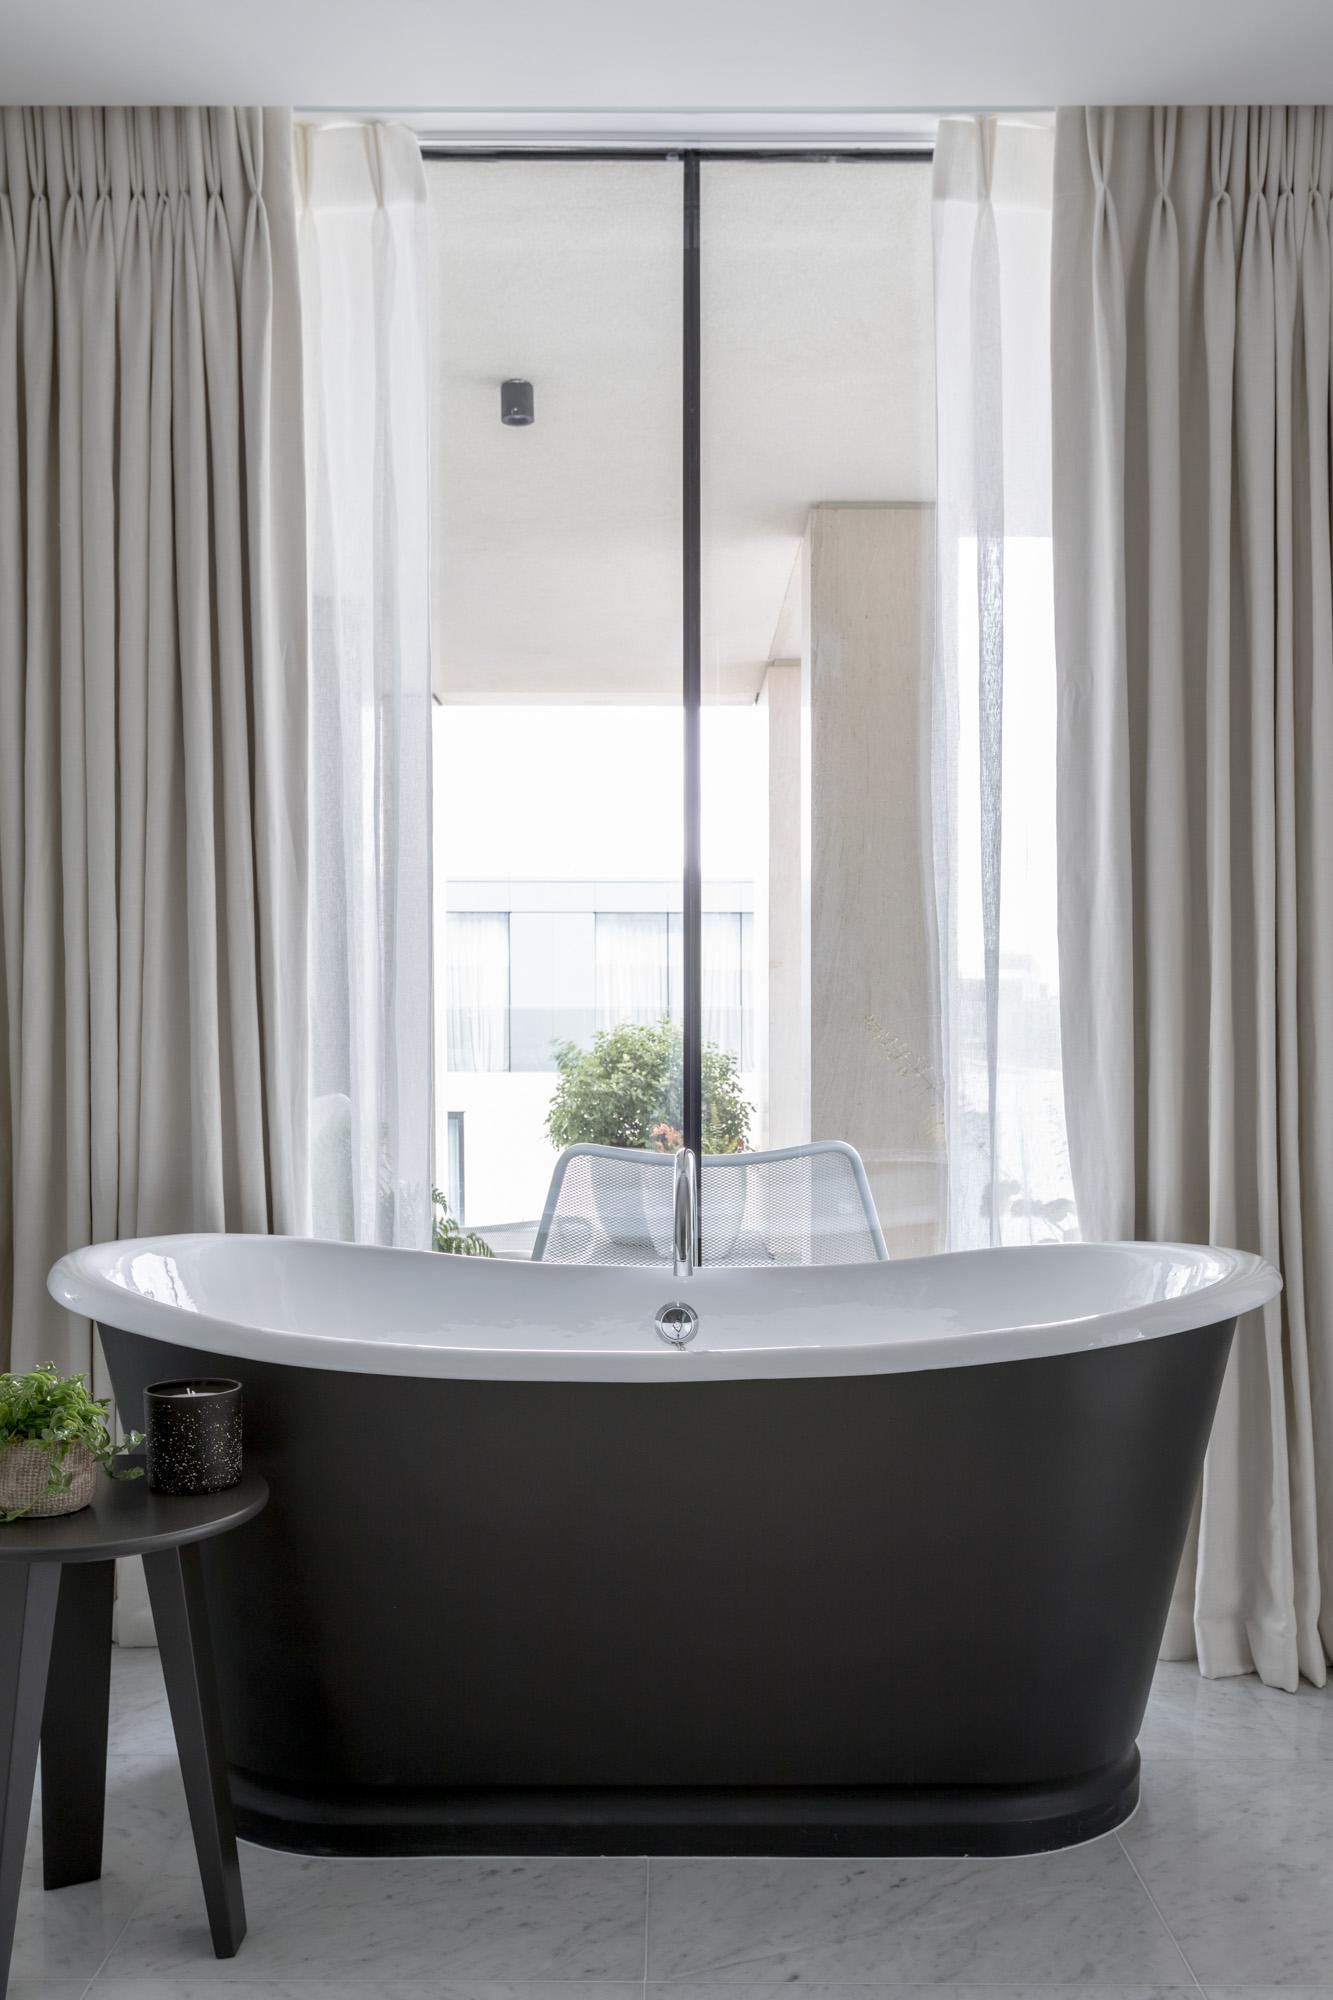 jonathan bond, interior photographer, black freestanding bath, battersea, london